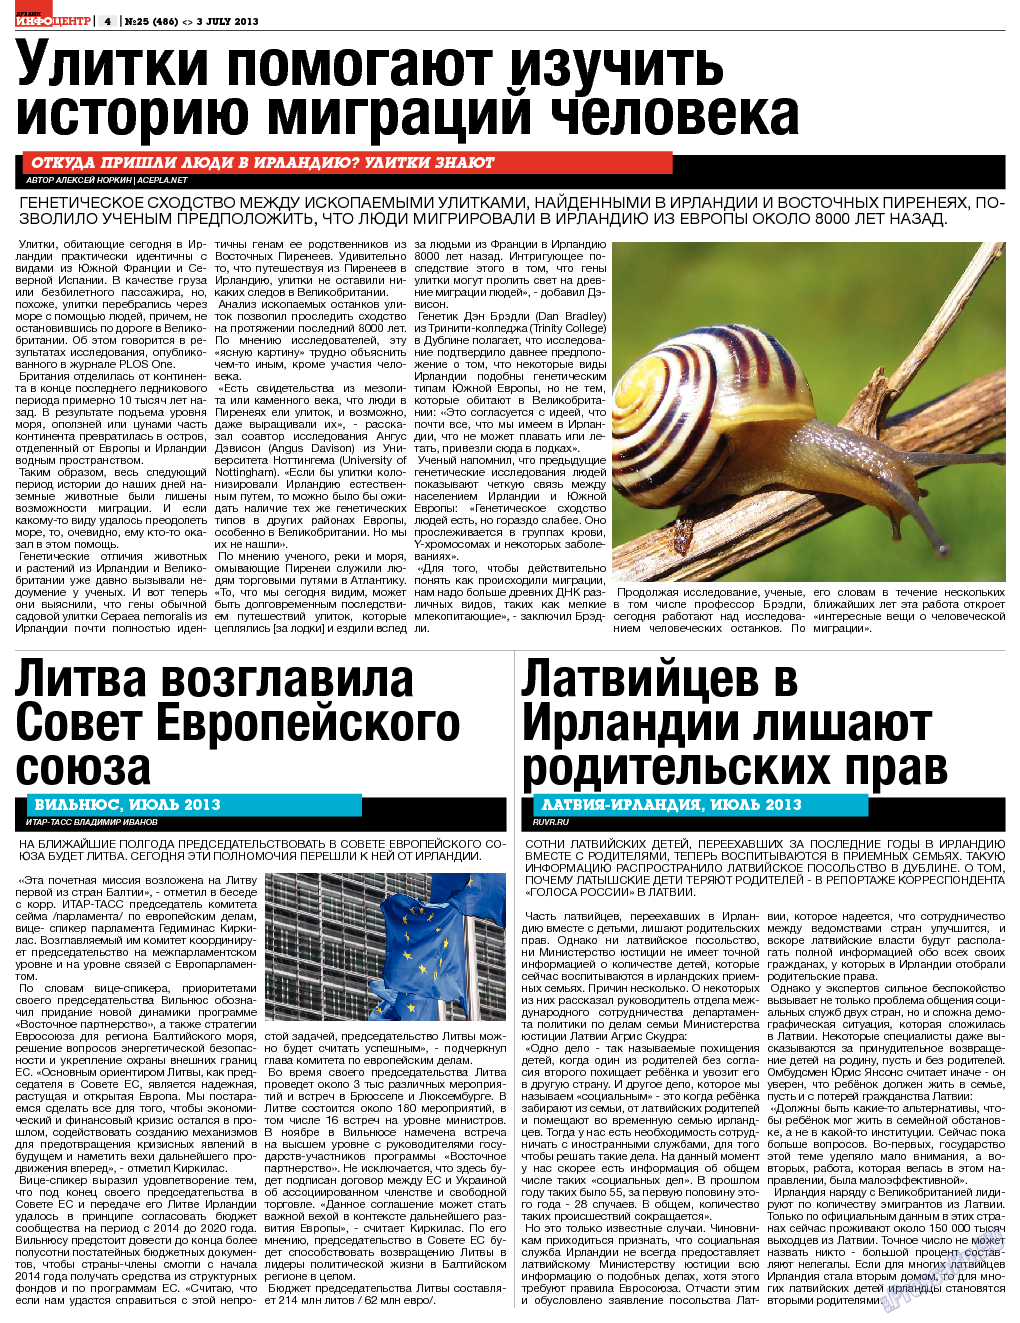 Дублин инфоцентр (газета). 2013 год, номер 25, стр. 4